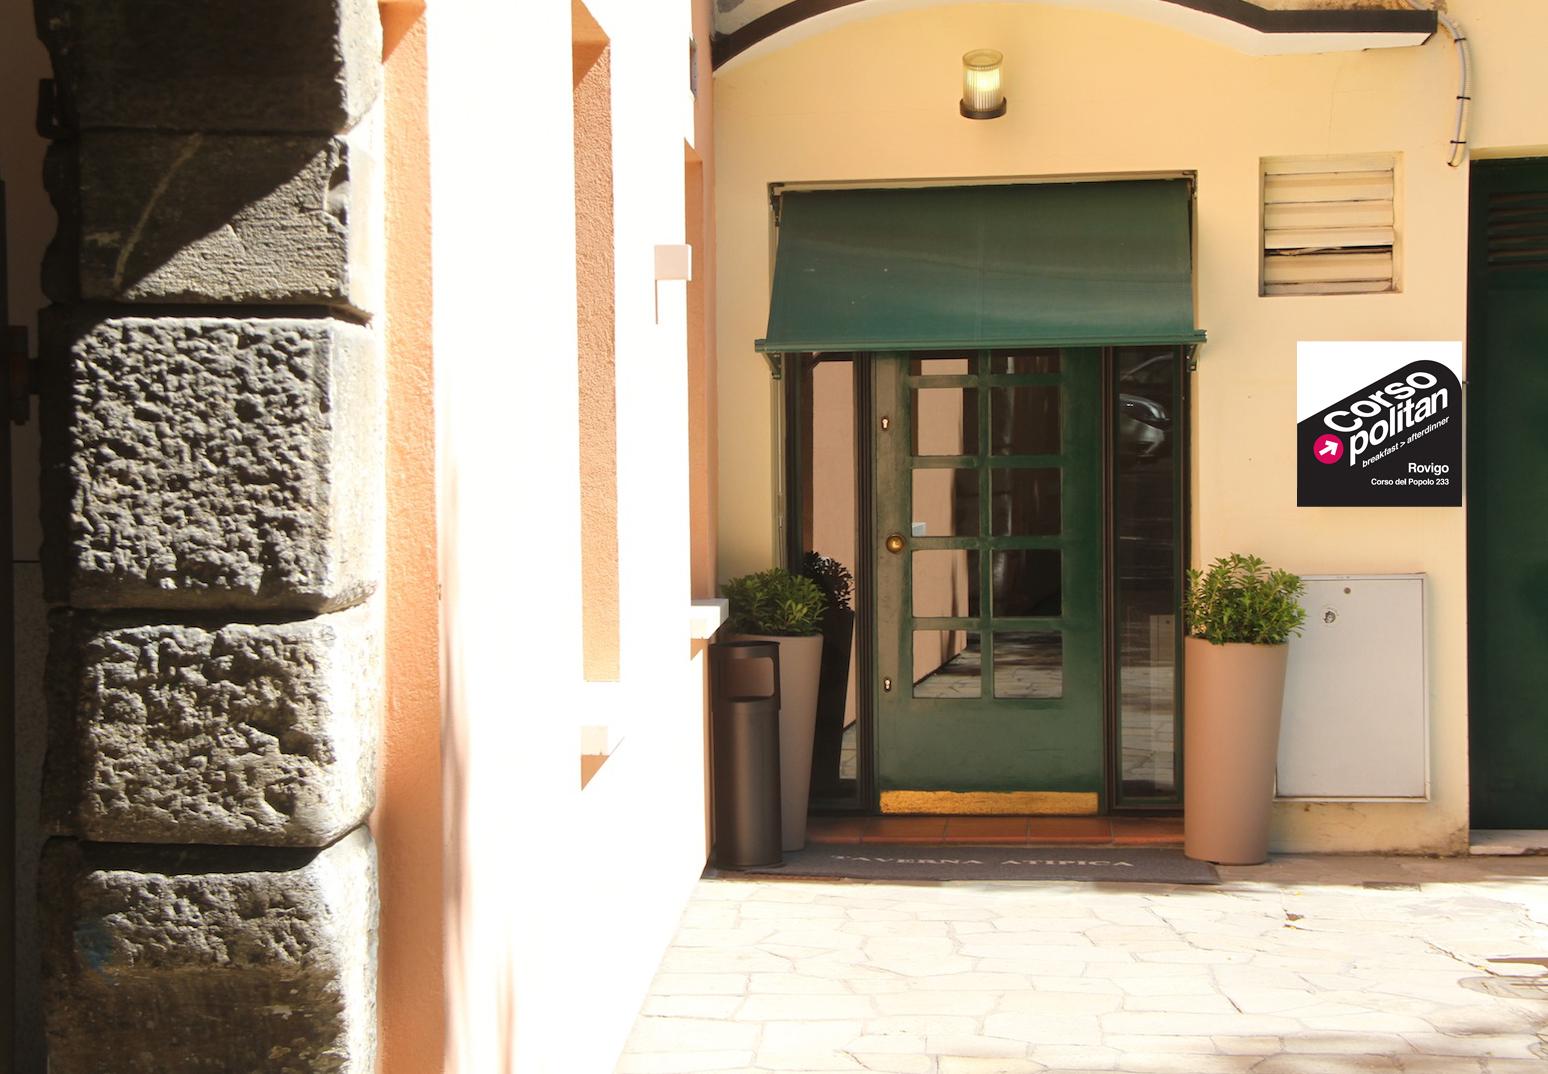 Corsopolitan acquista l'ex Taverna in piazza Merlin